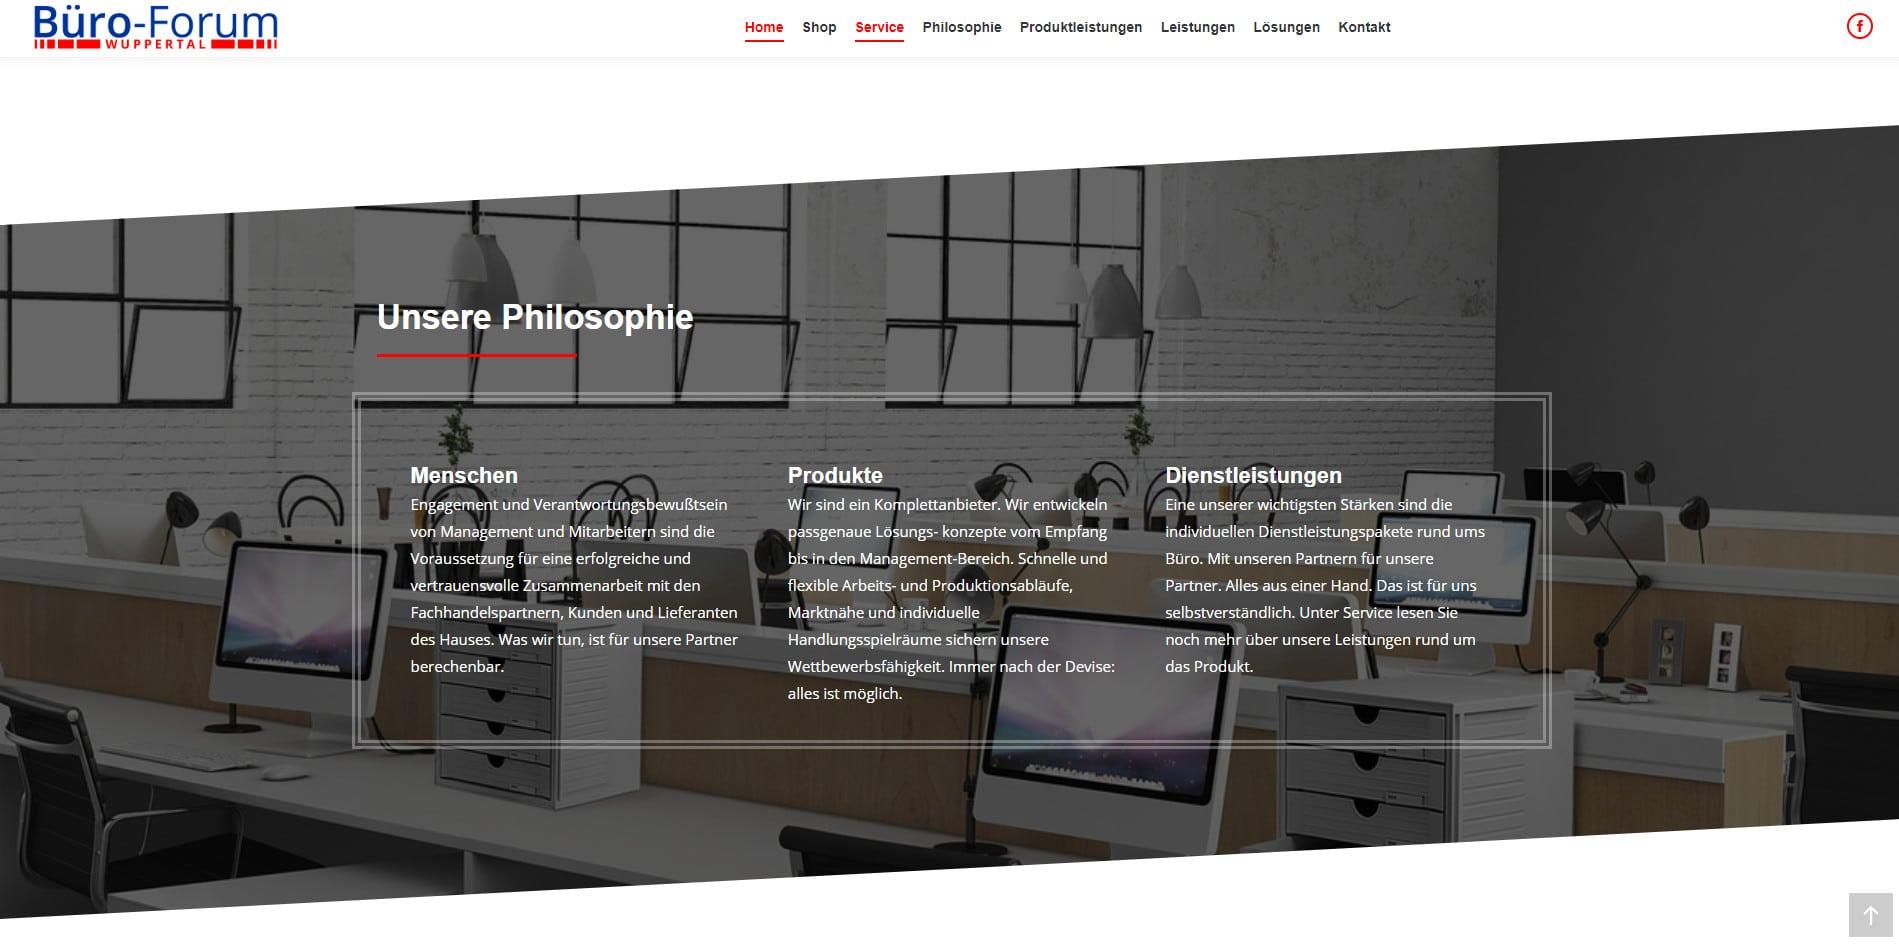 Büro-Forum Wuppertal WordPress